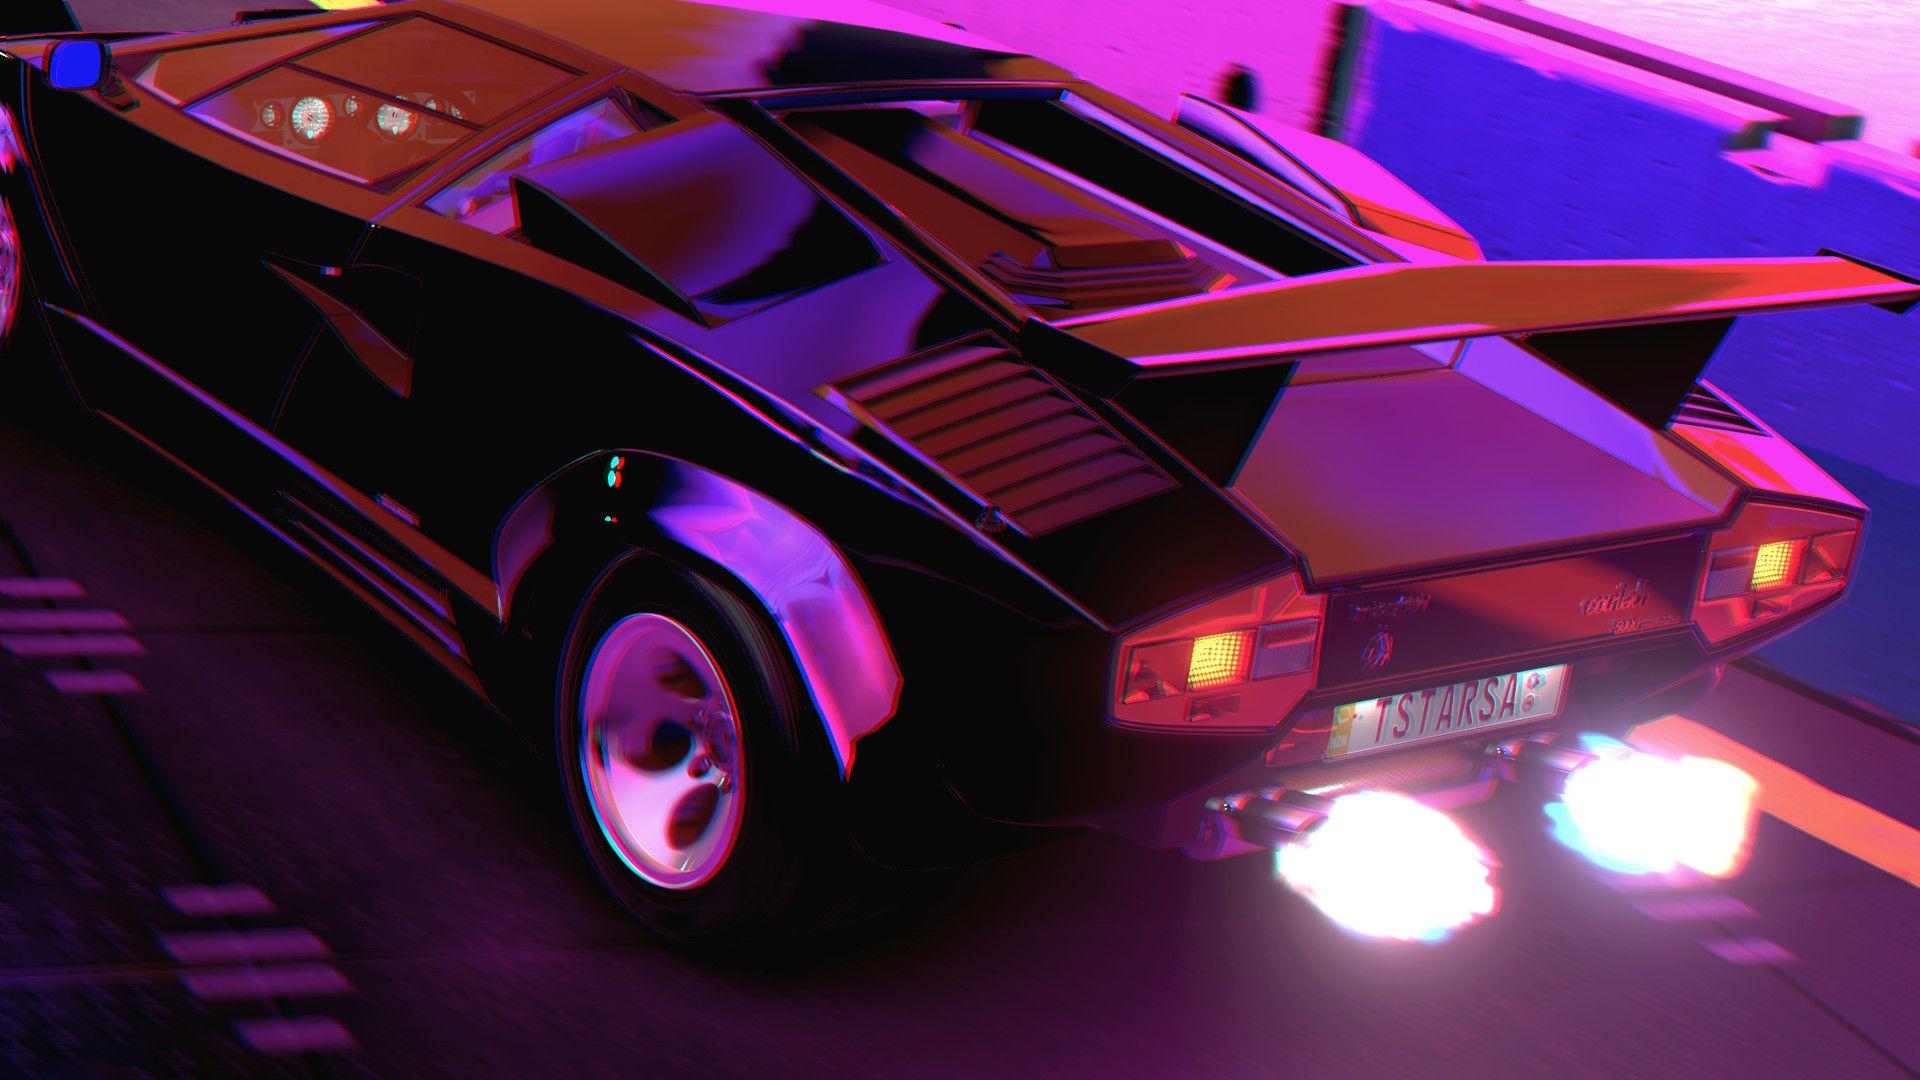 Retro Synth 80s Car City Neon Road Night Purple Wallpaper Classic 80 Ler Araba Sehir Isik Yol Gece M Lamborghini Lamborghini Countach Neon Car